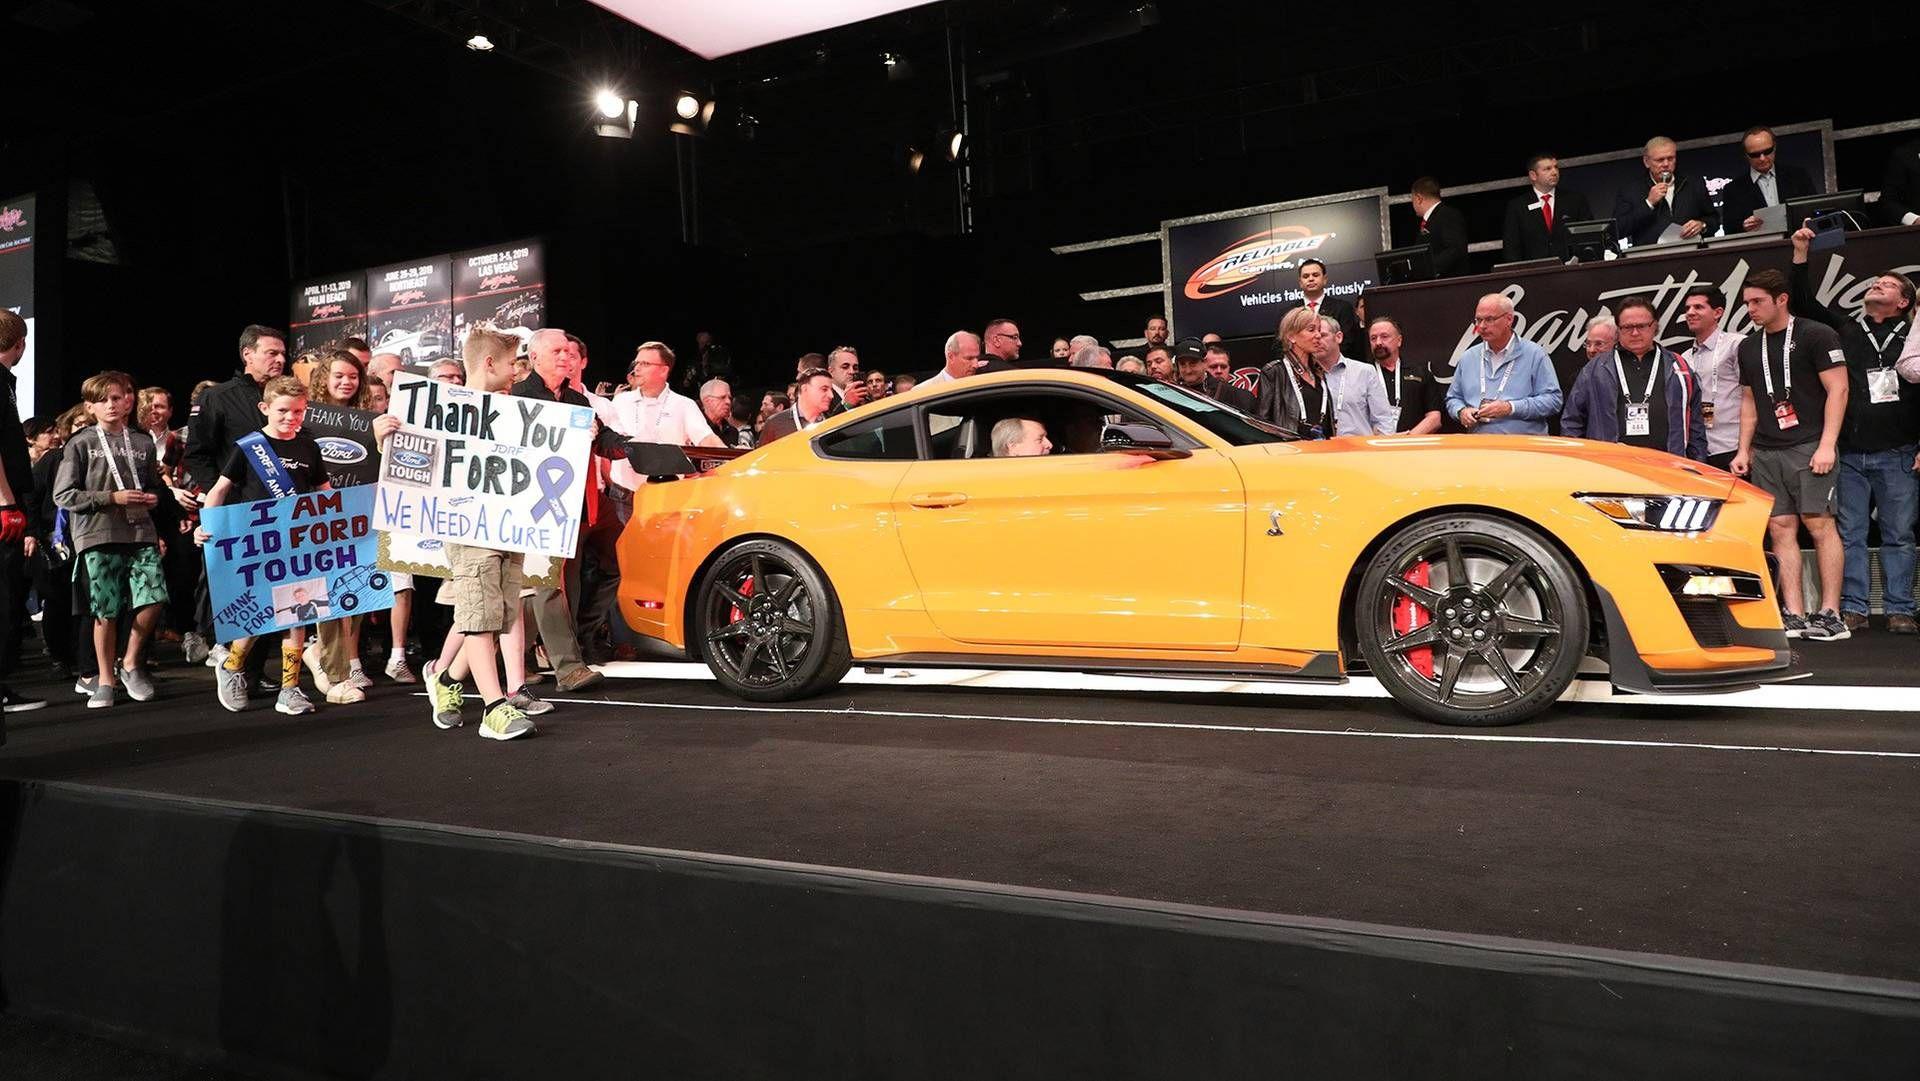 2020 Ford Mustang Shelby Gt500 Nets 1 1 Million Winning Bid At